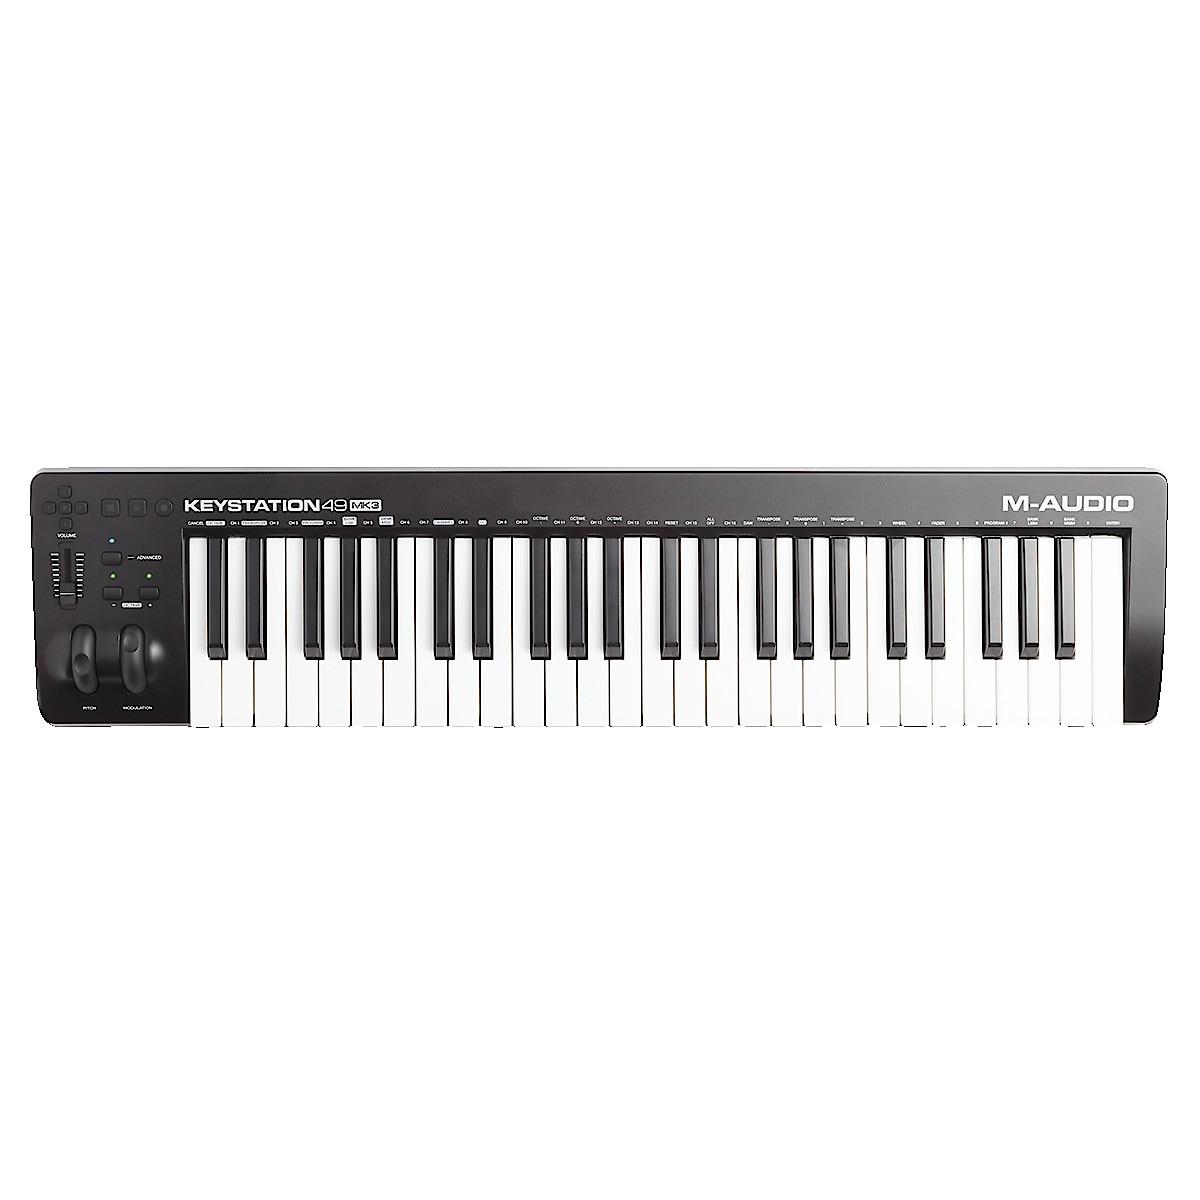 USB-kontroller Keyboard M-Audio Keystation 49 MK3